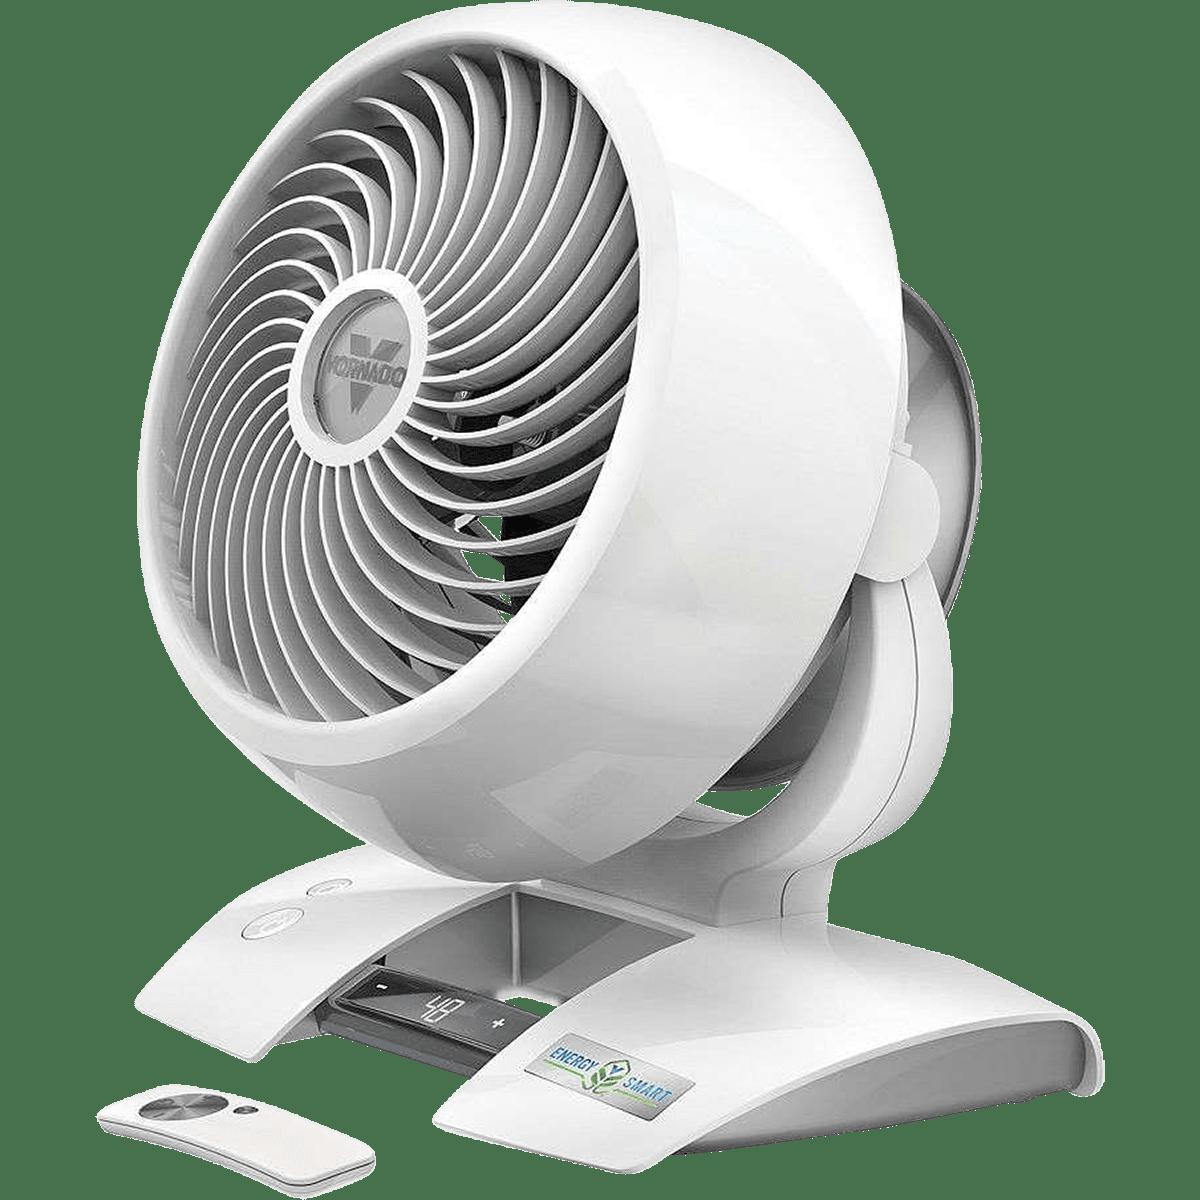 Vornado Air Circulator : Vornado dc air circulator free shipping sylvane